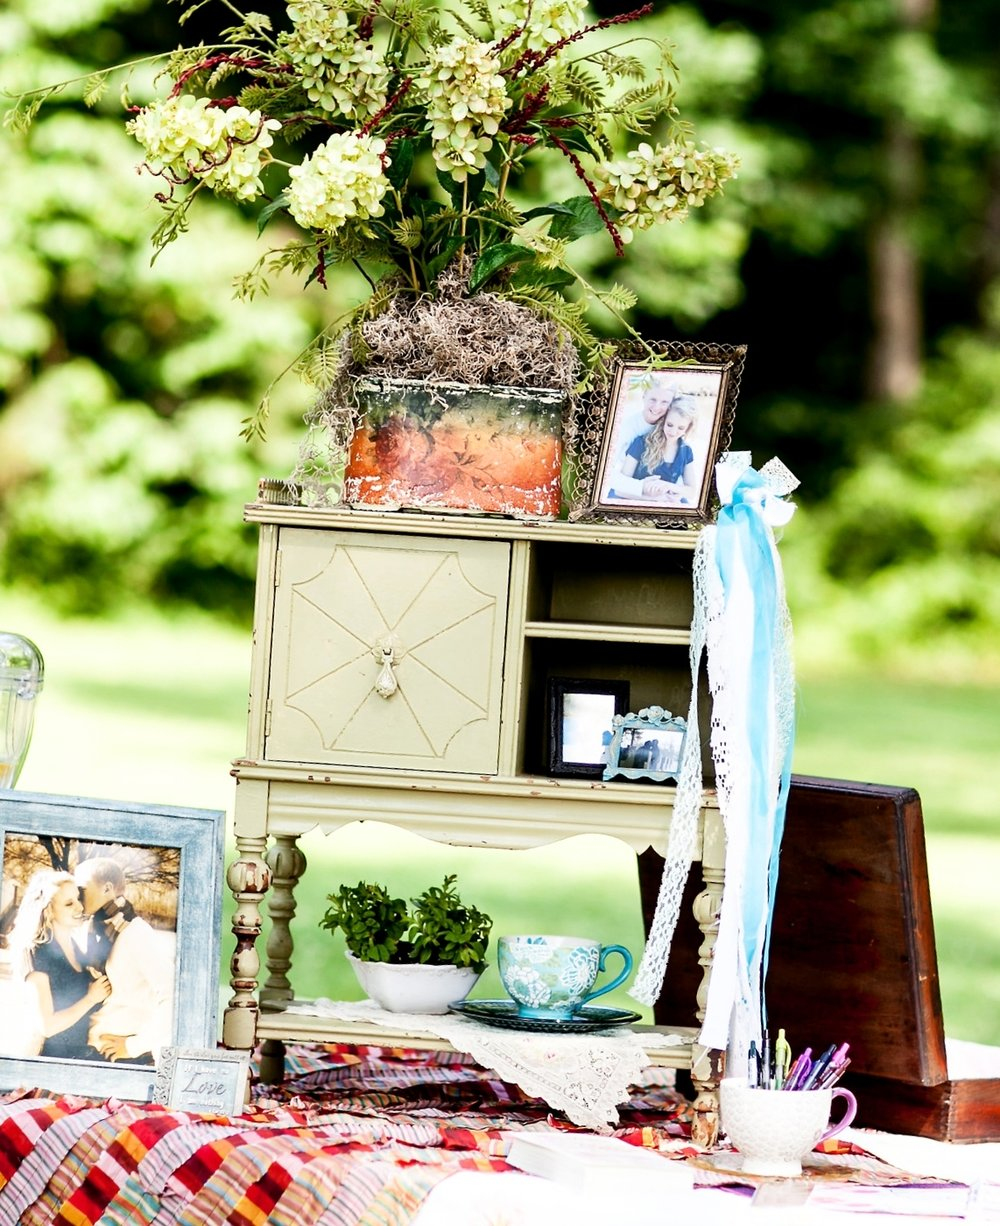 Green Hydrangea Floral , Green Tobacco Cabinet